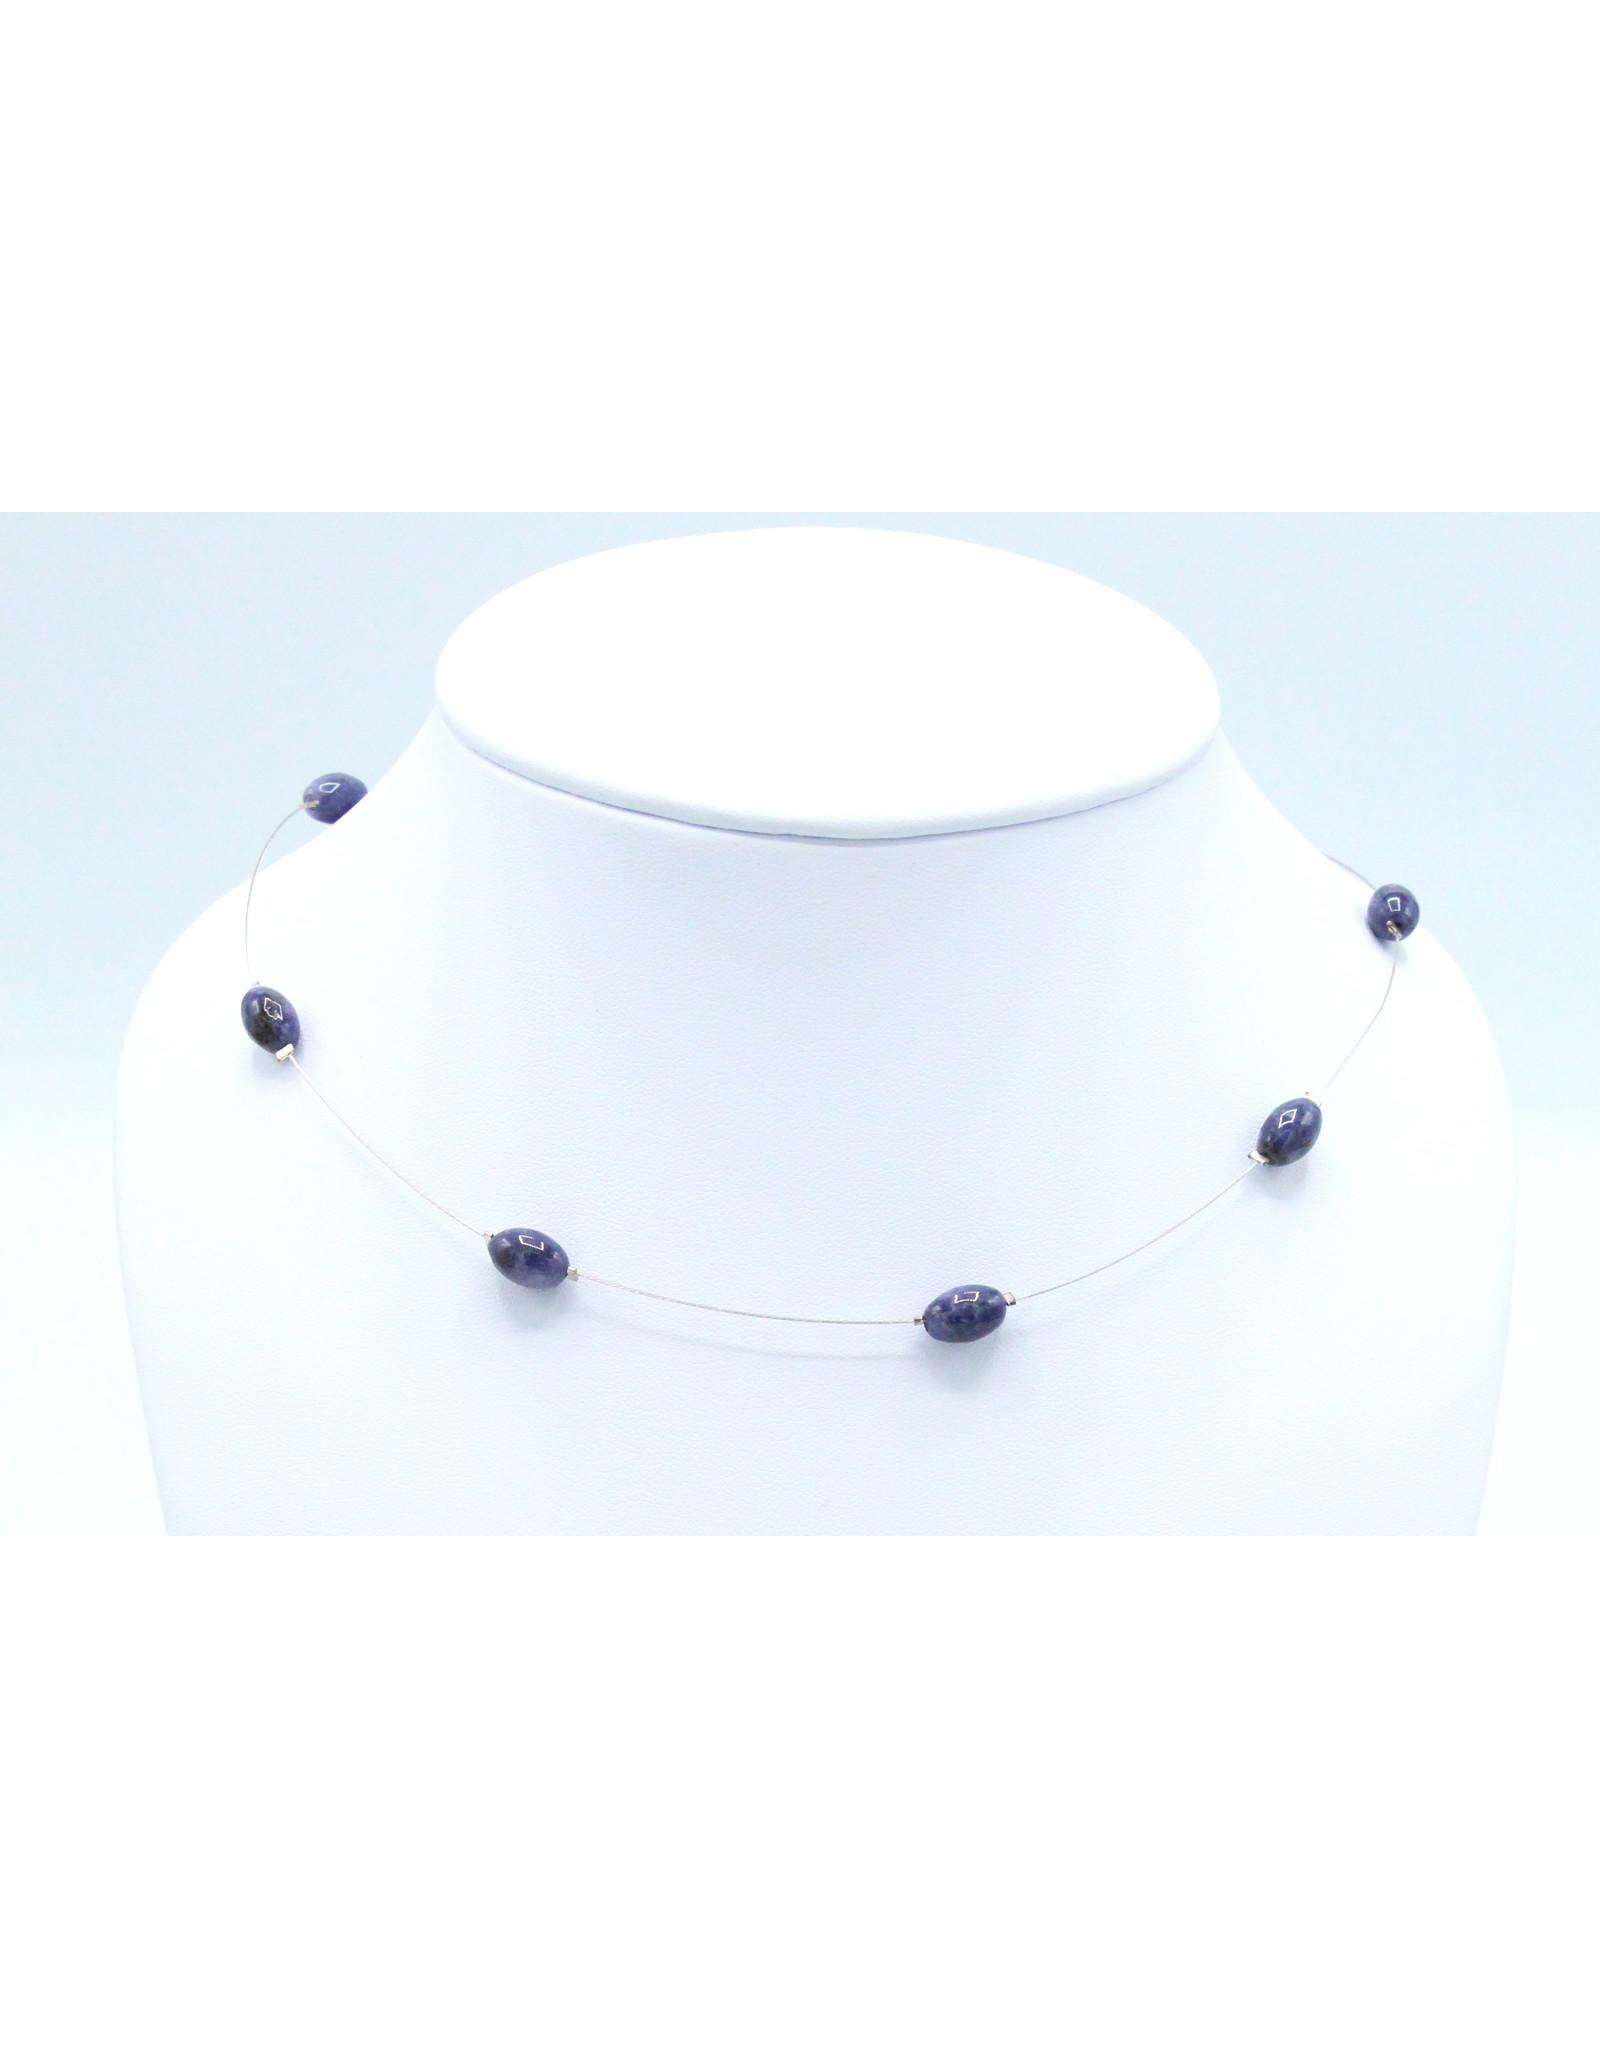 Scapolite Necklace - NSCAP08